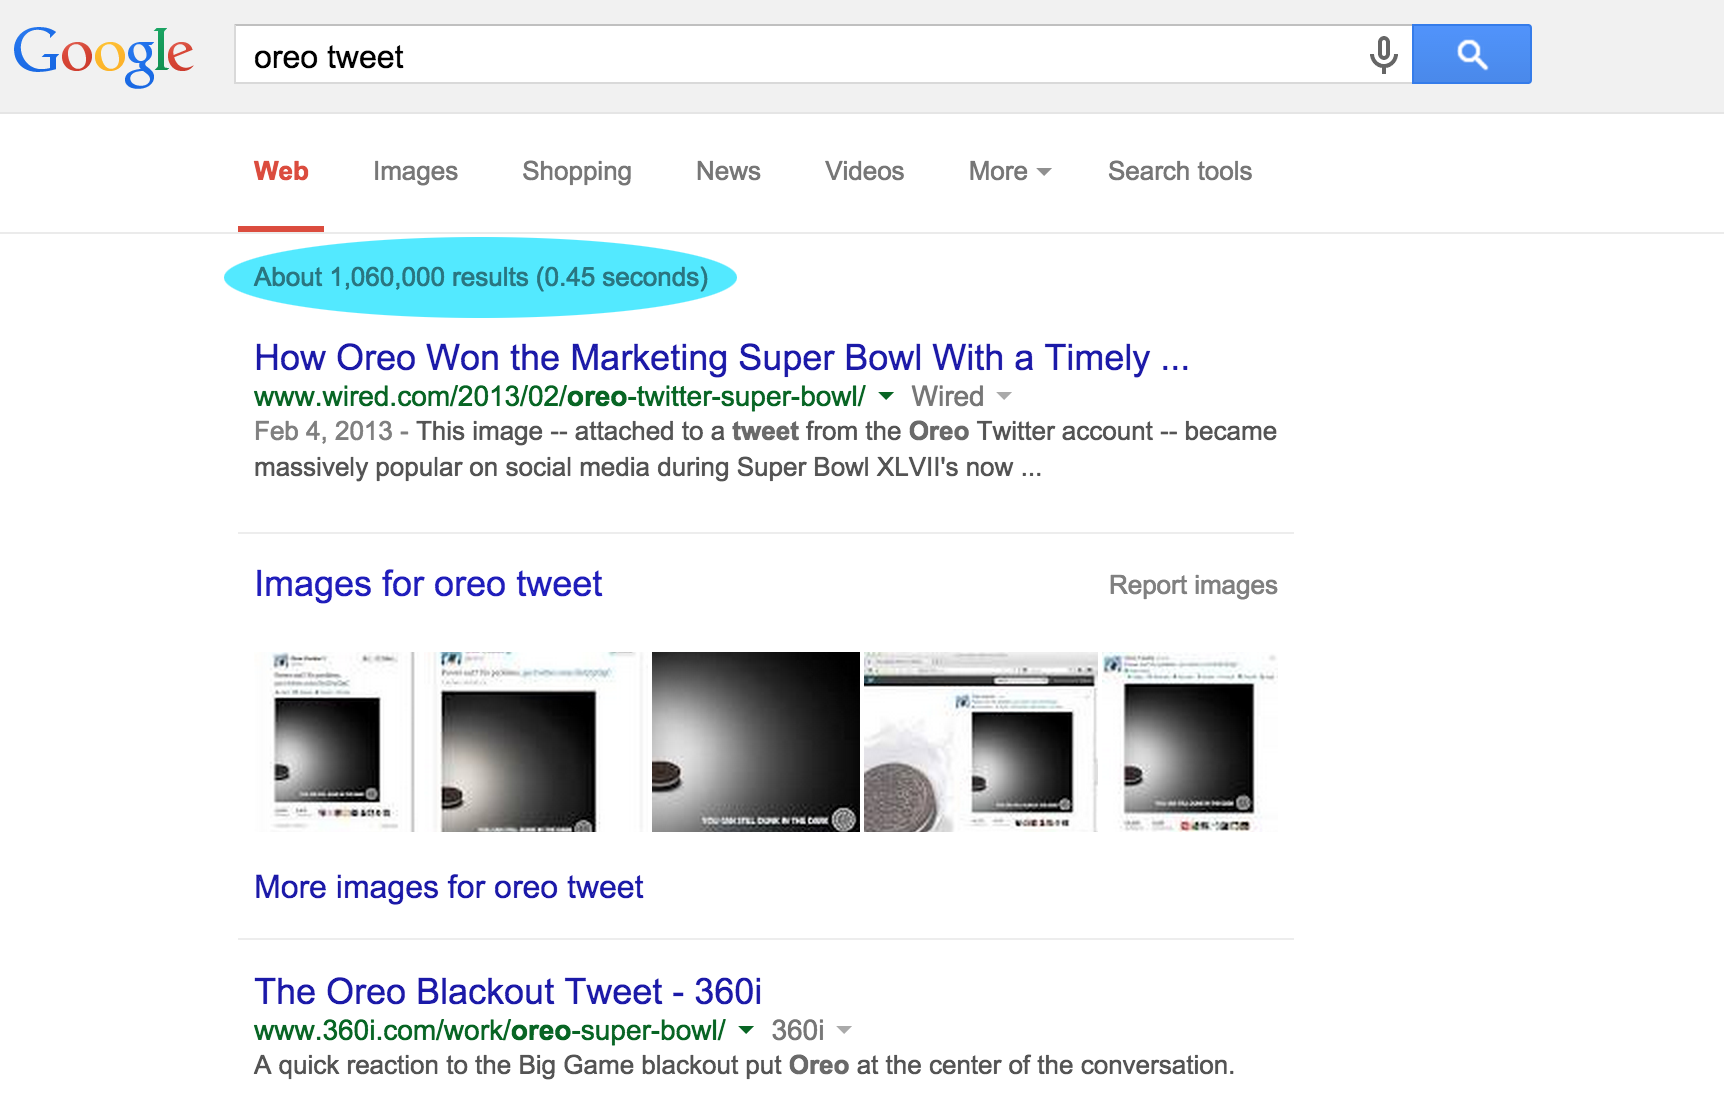 Oreo-Tweet-Search